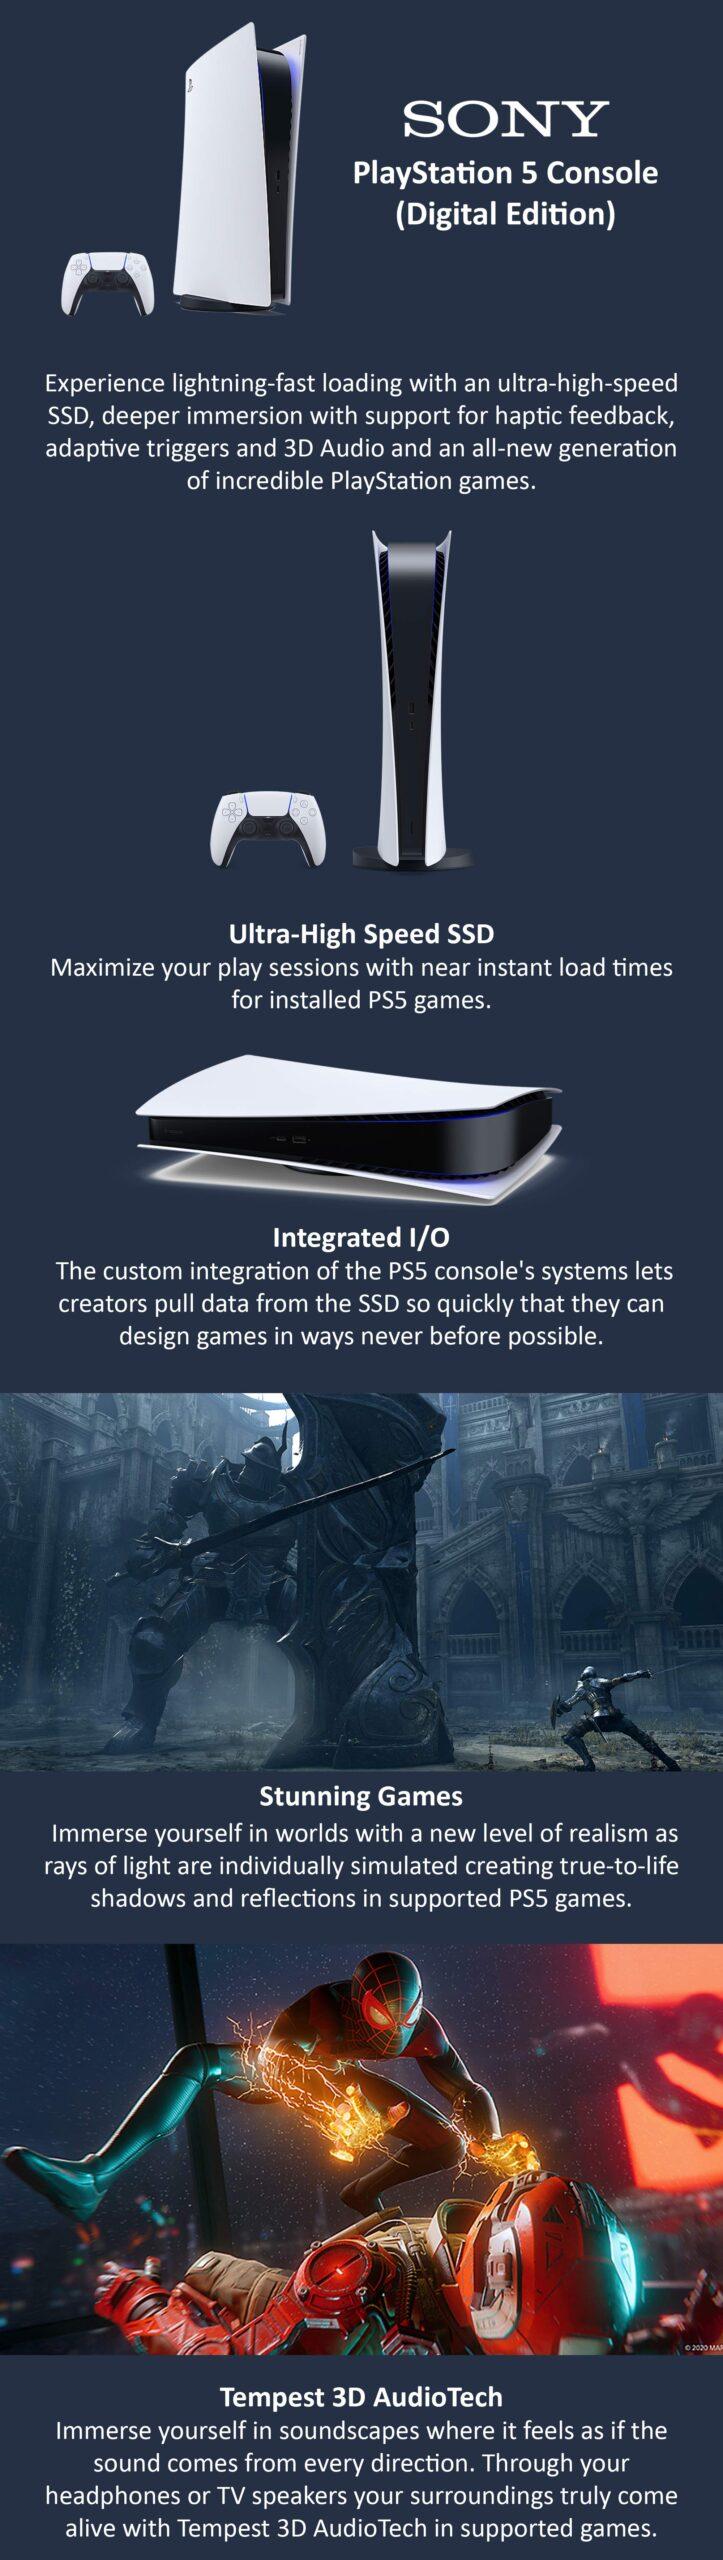 Sony-playstation-5-dubai